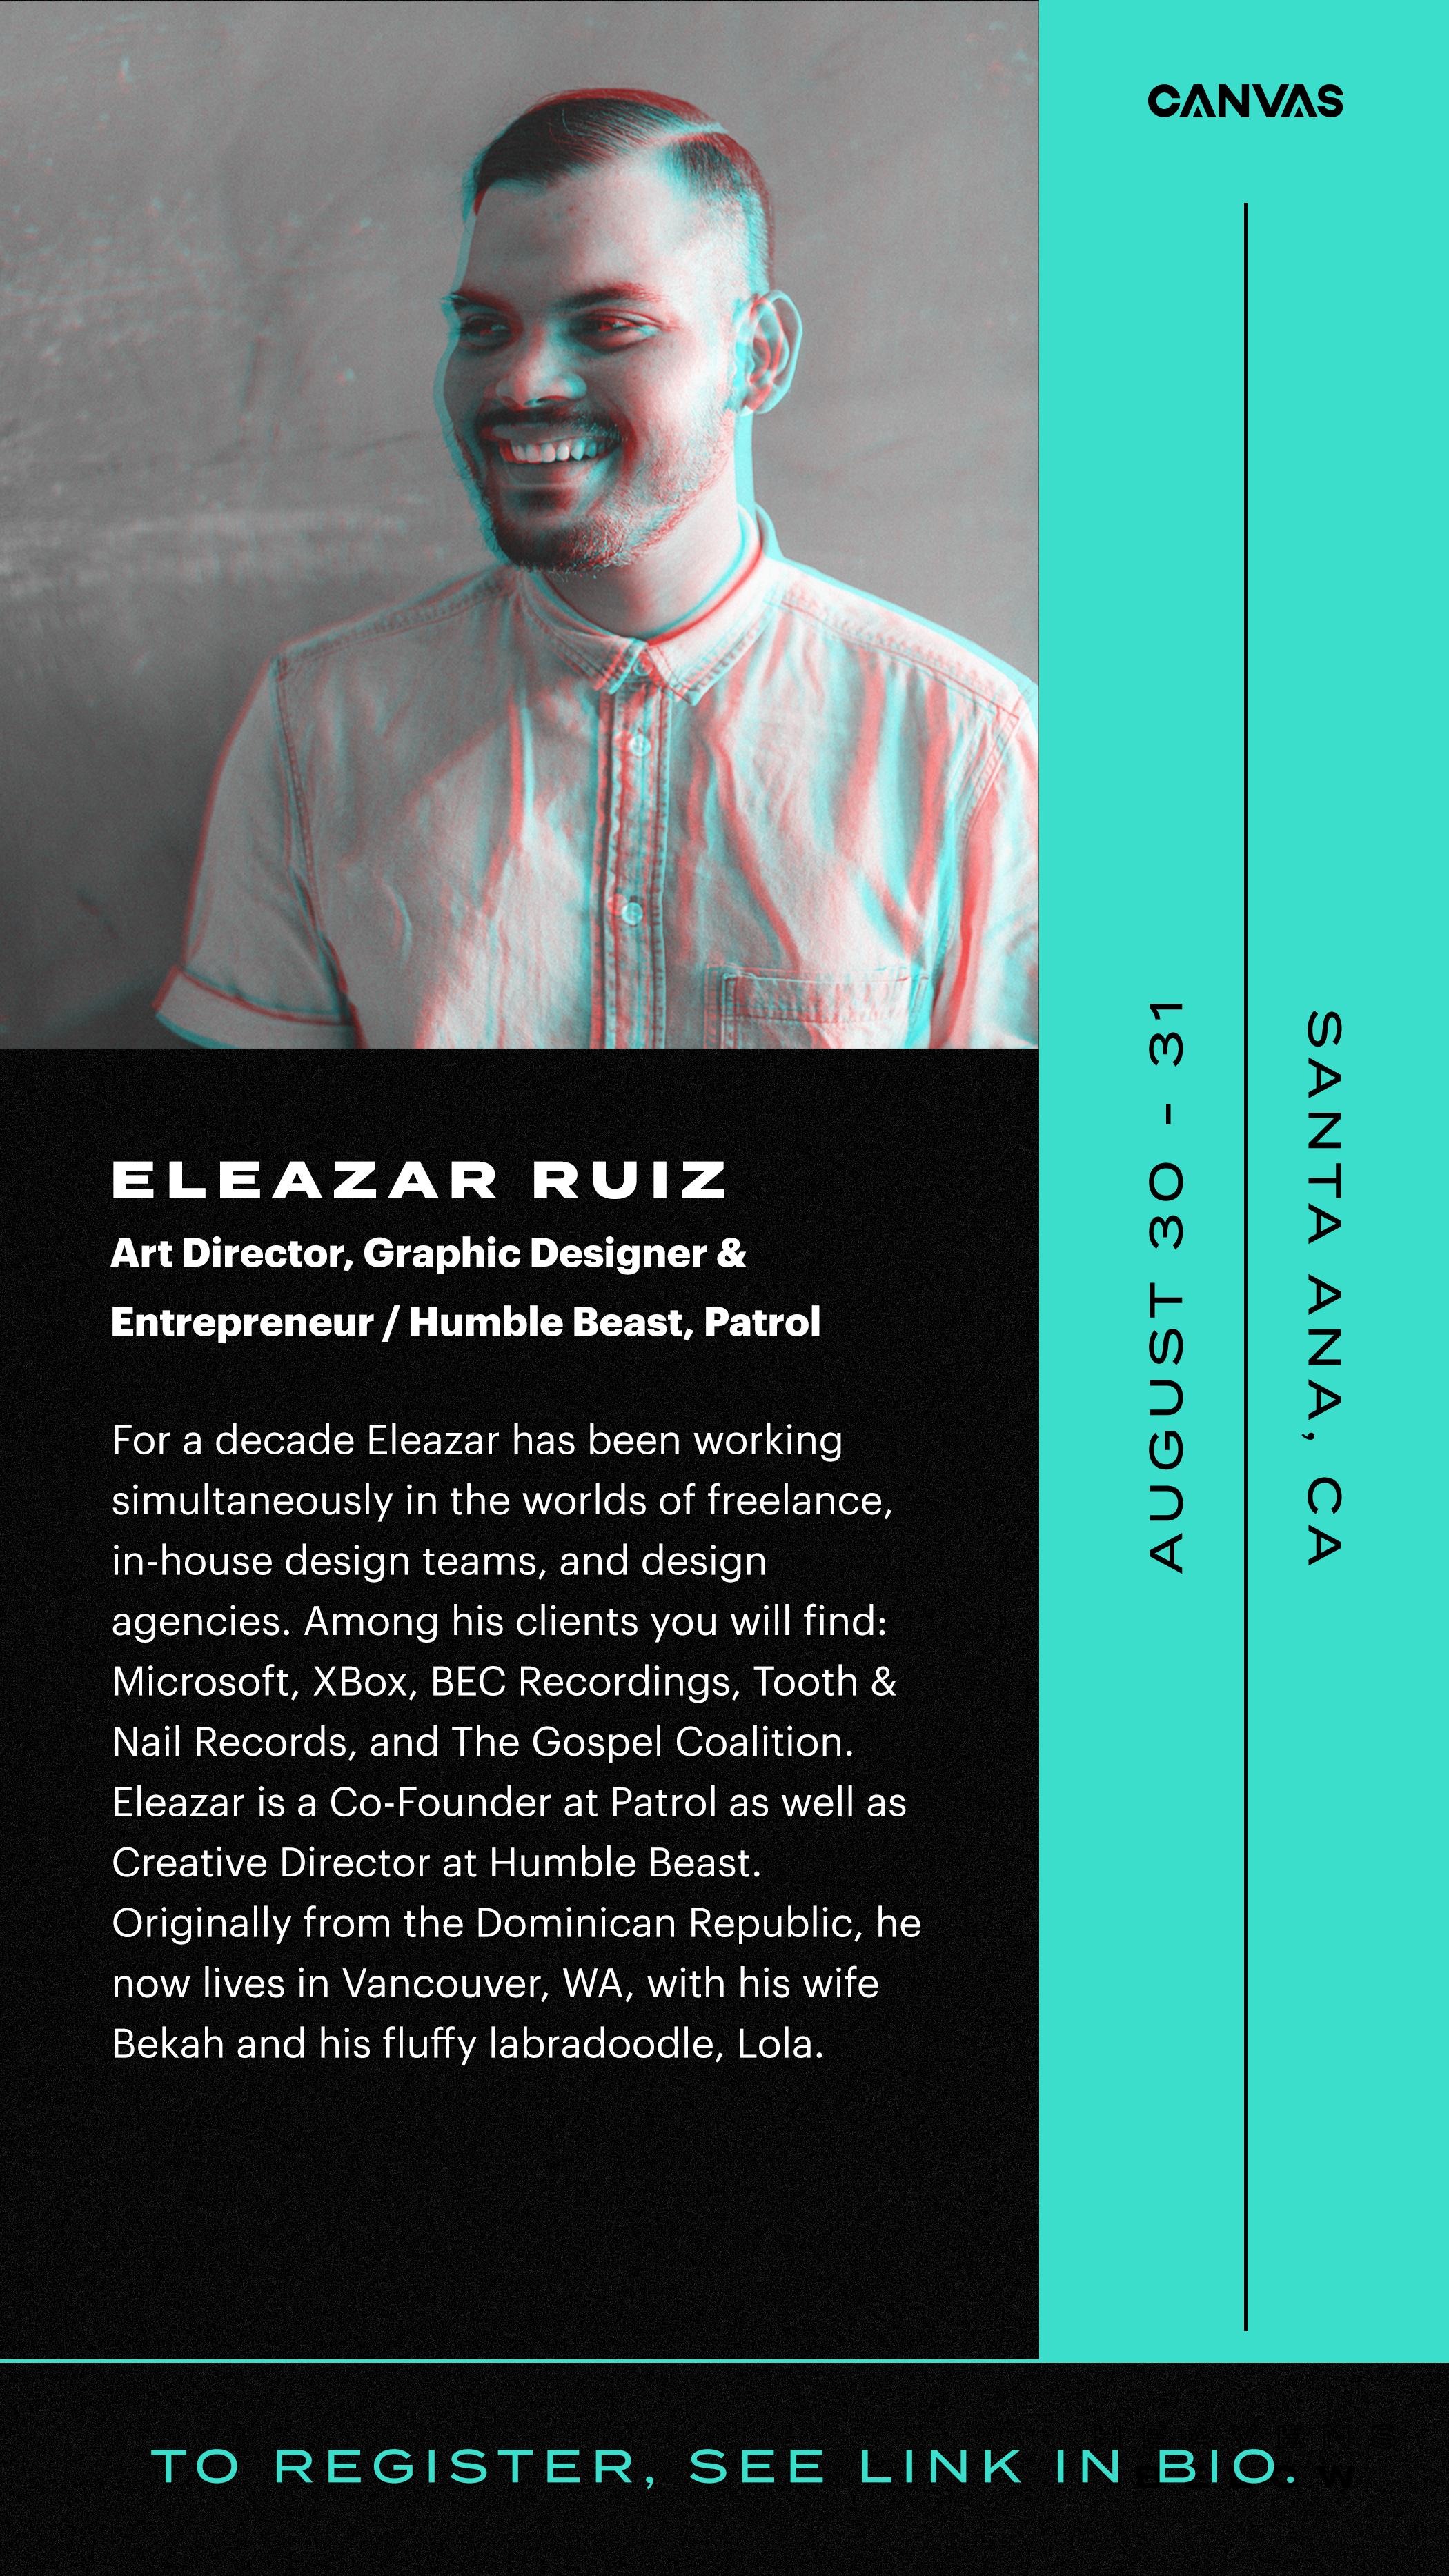 Eleazar-Ruiz_story.jpg